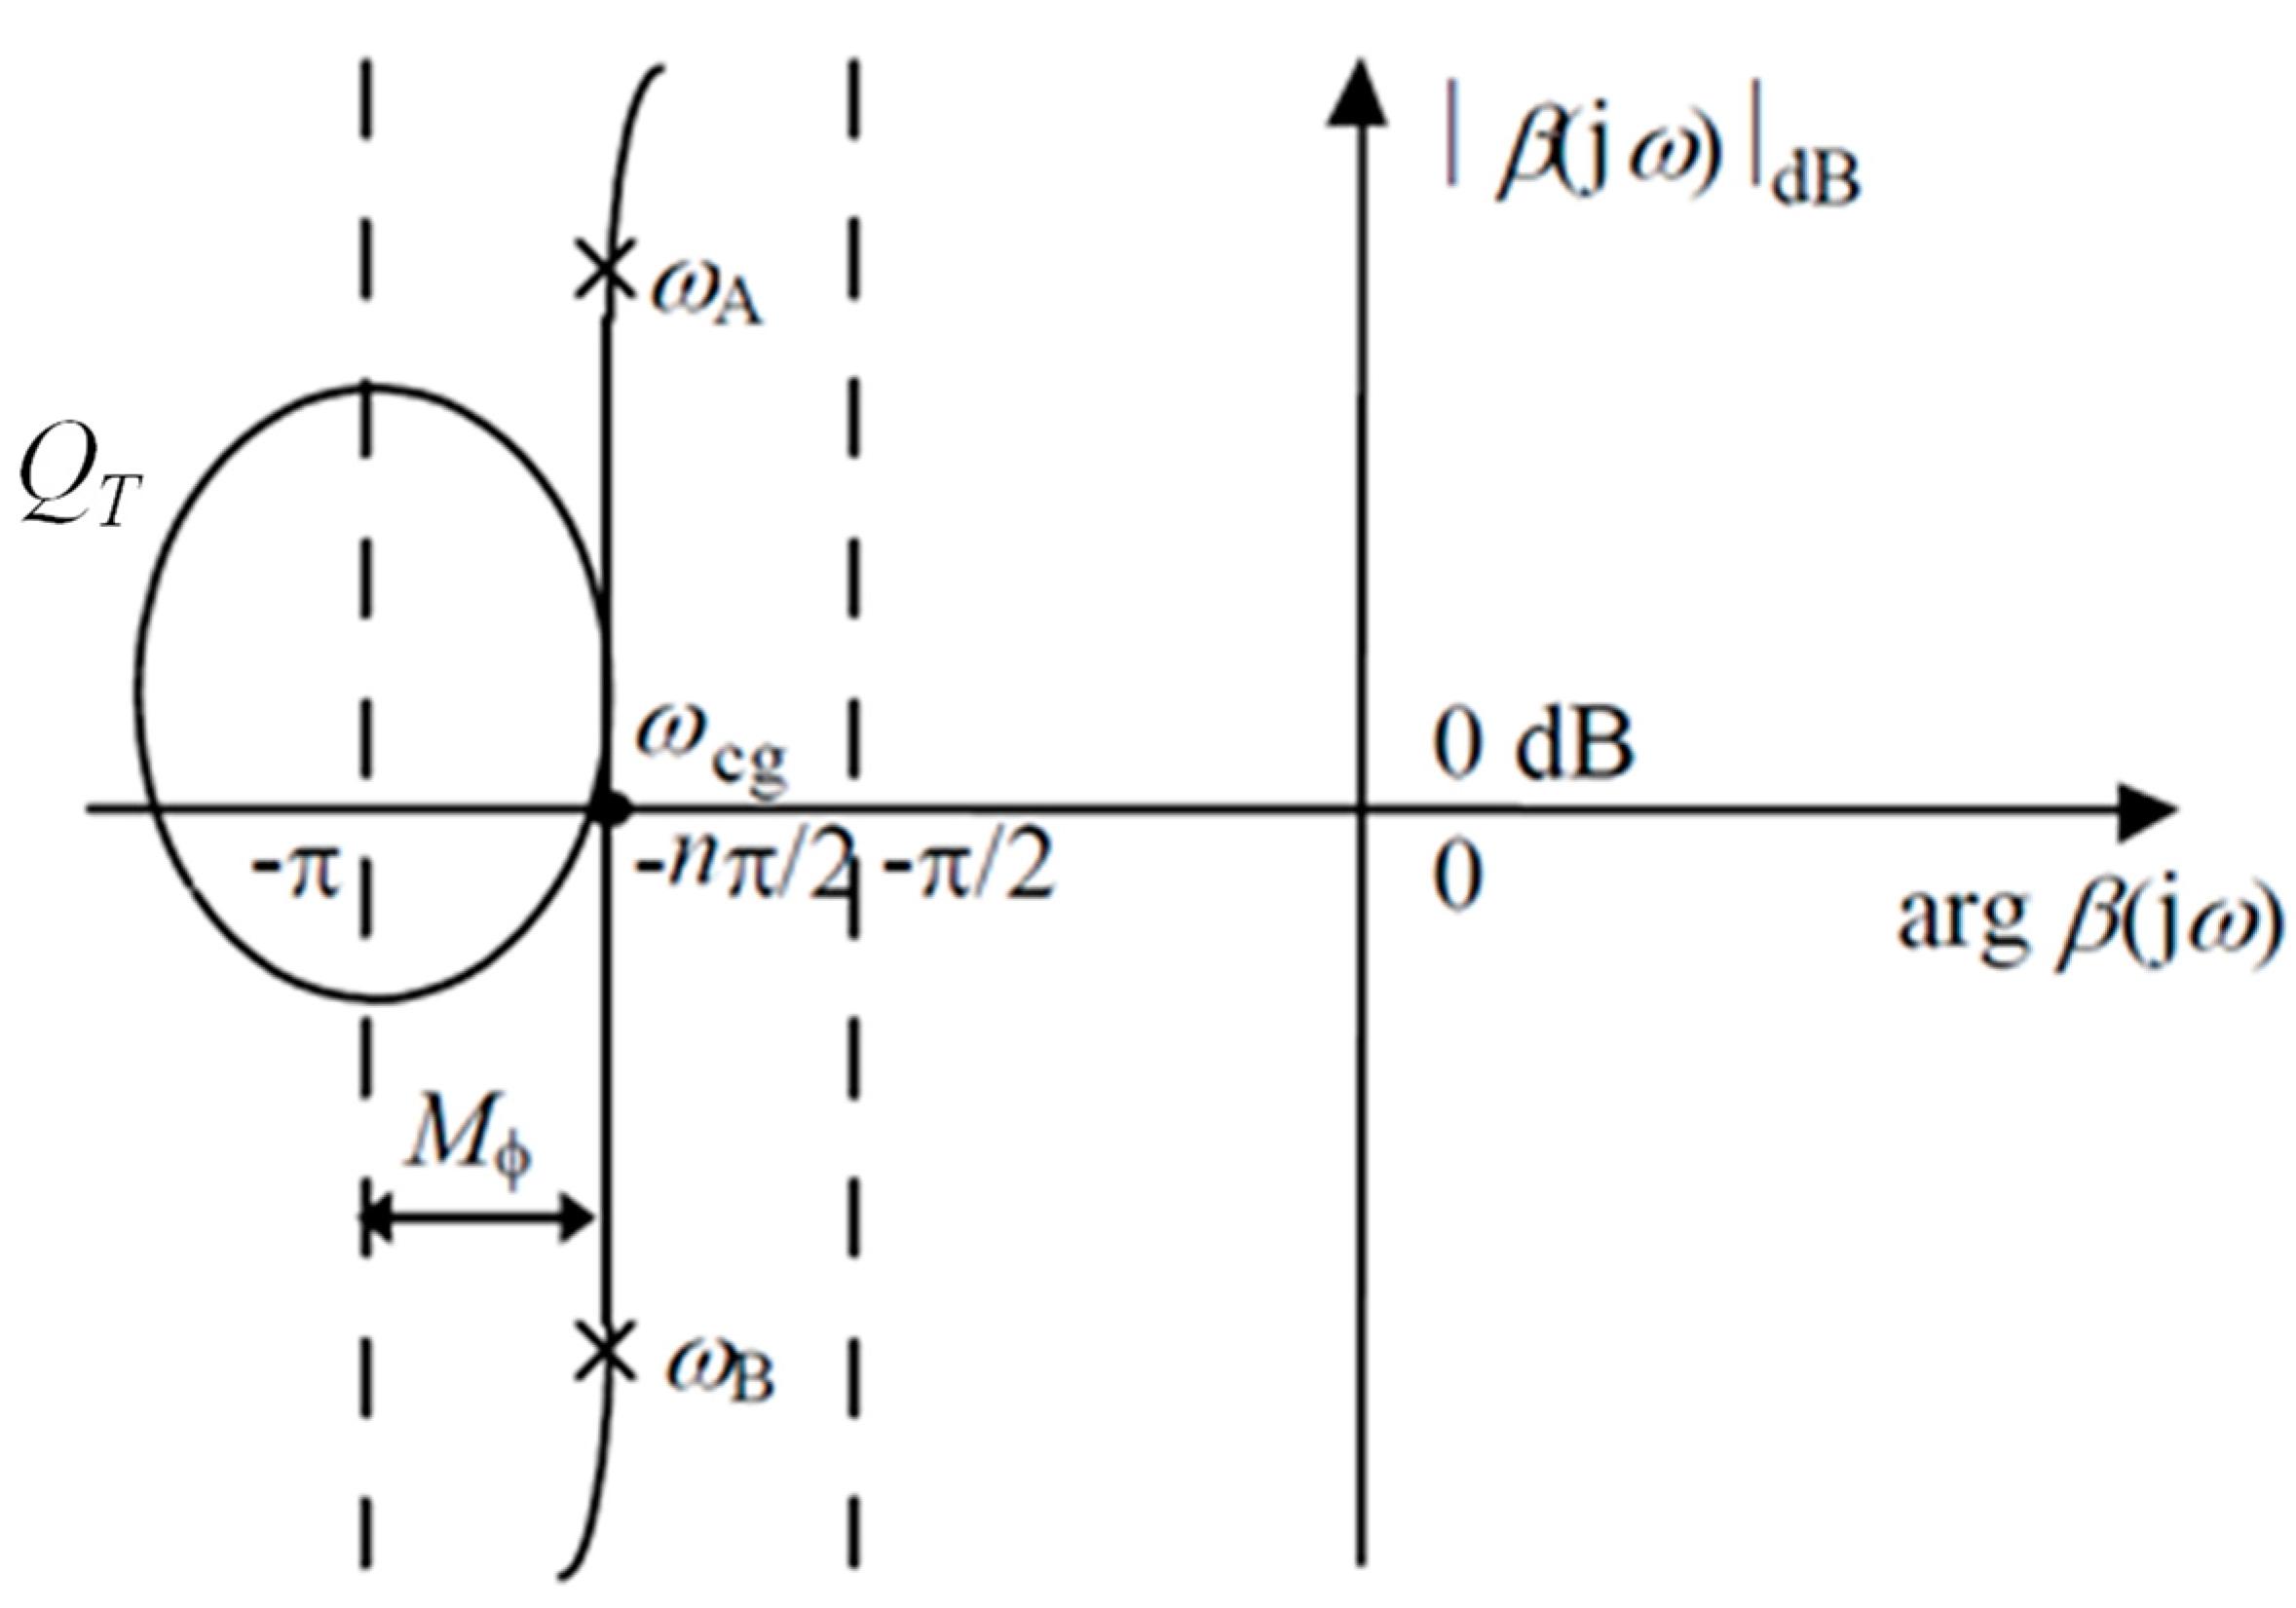 fractal and fractional